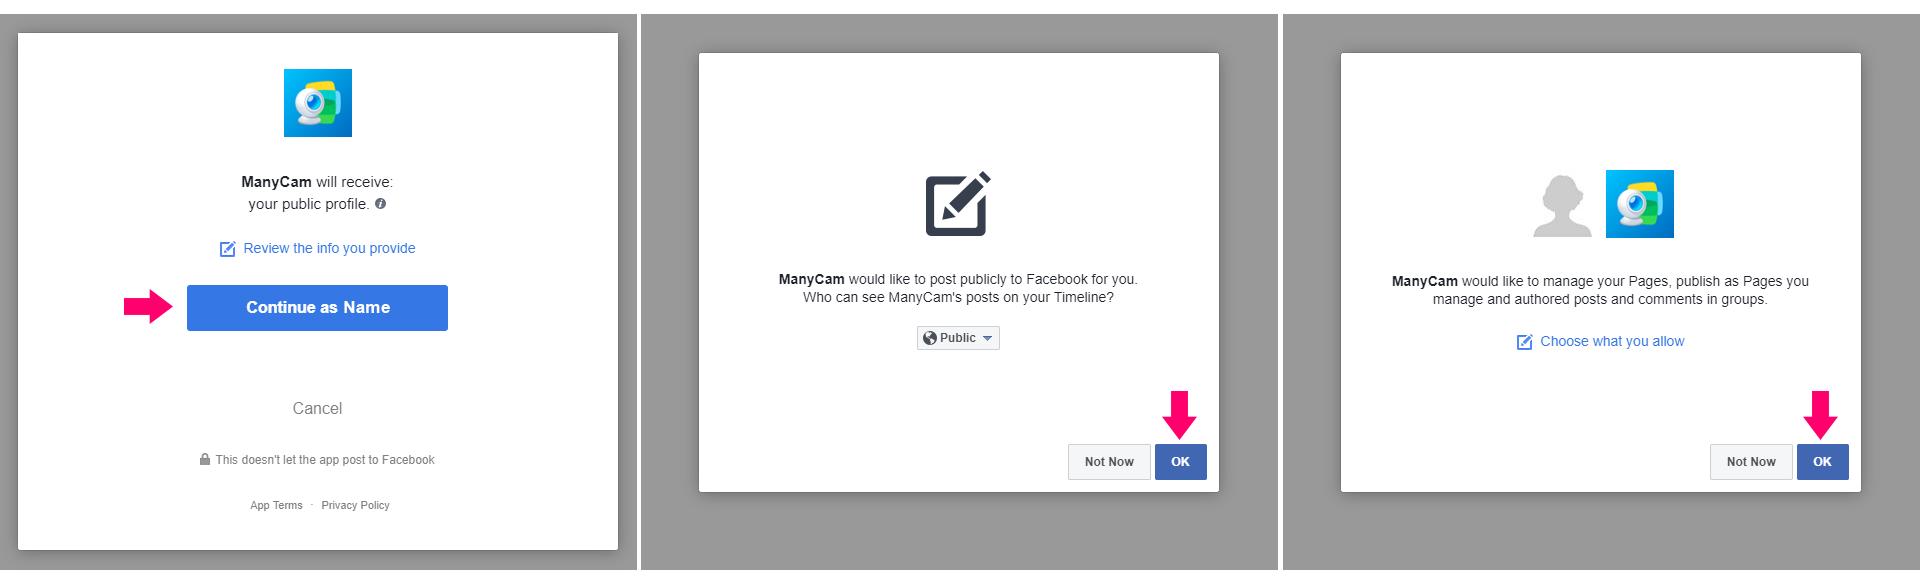 Authorize ManyCam - Facebook Live